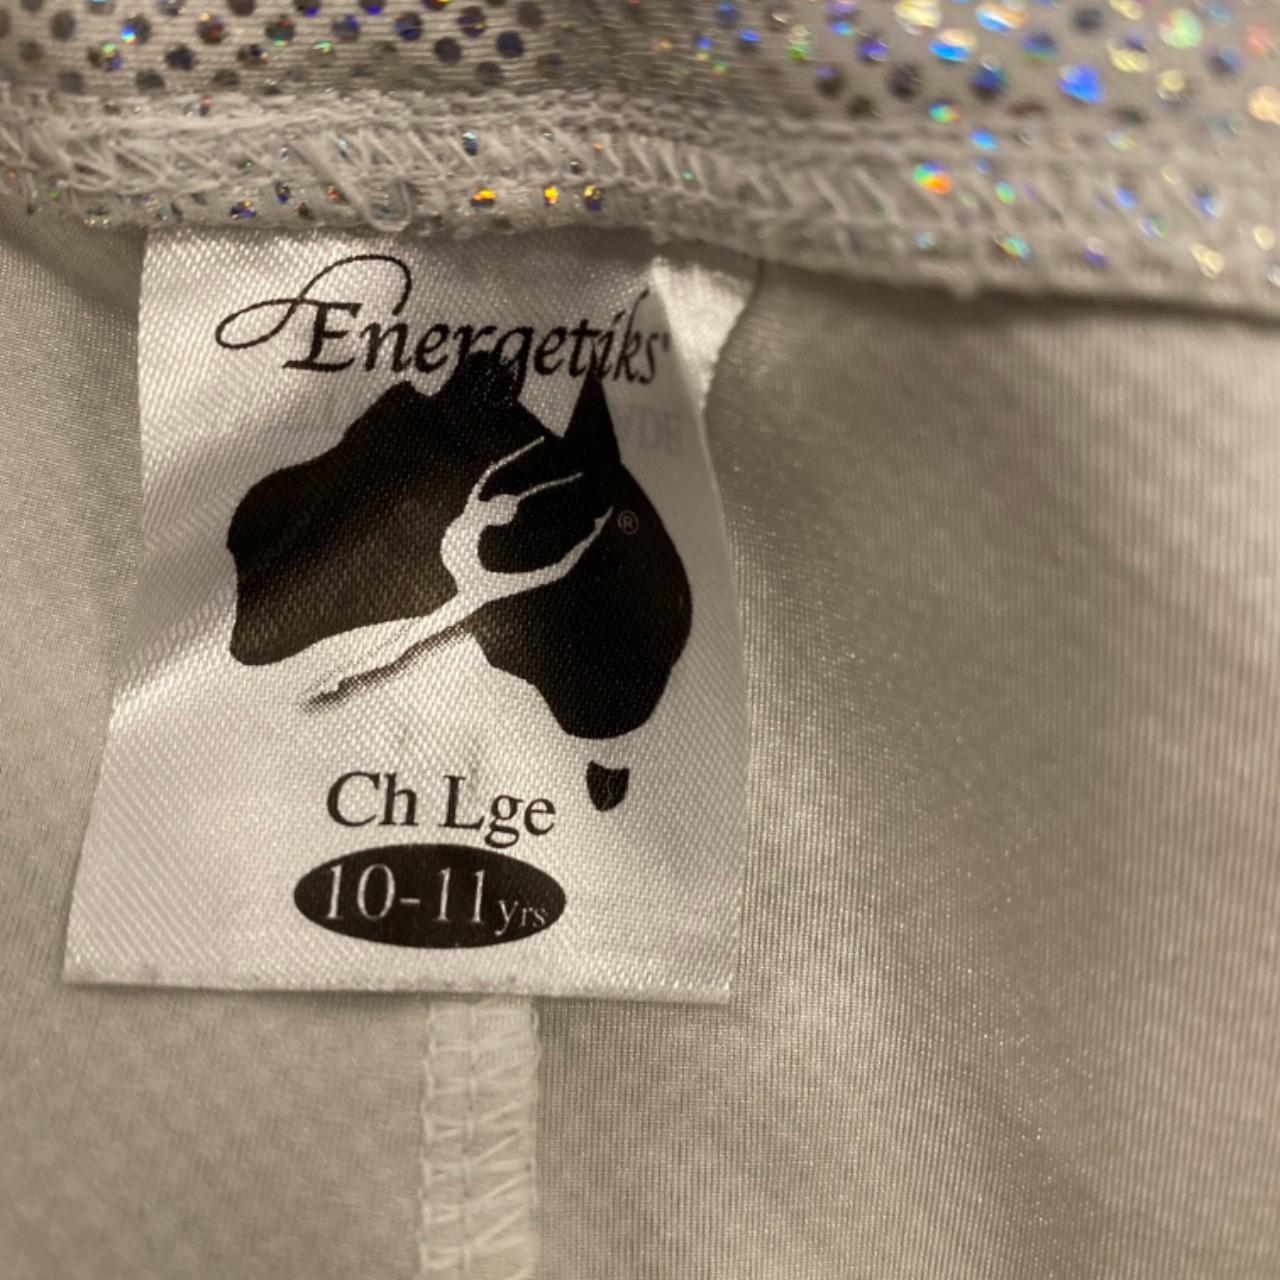 Girls ENERGETICS 2PCE GYMNASTICS/CHEERLEADING /DANCE  Size 10-11 yearsBlack /Multicoloured/Silver